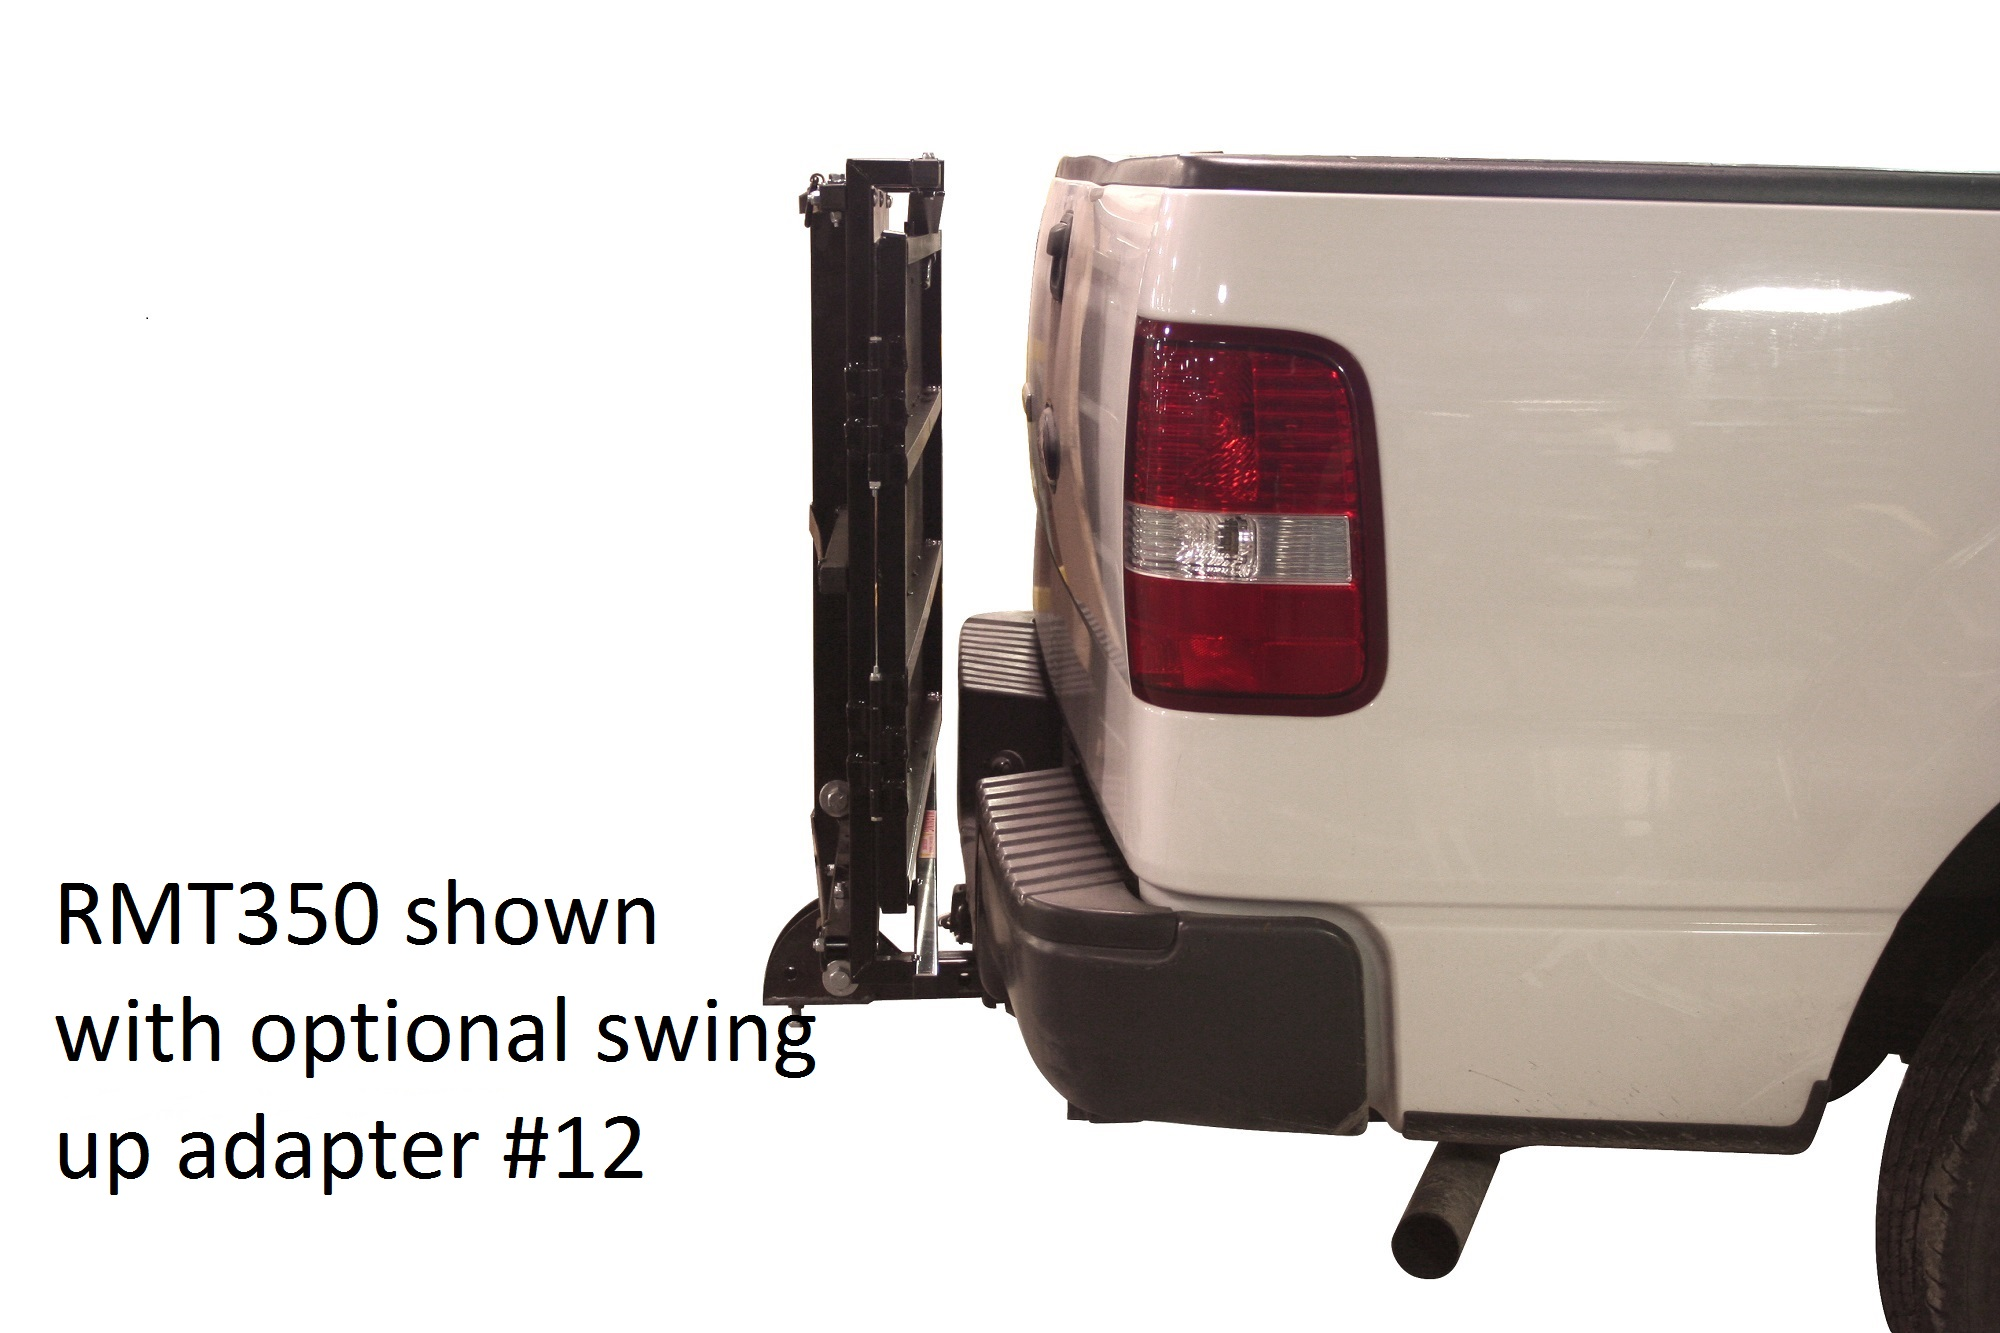 TrekAway 4' Ramp Style Scooter Carrier